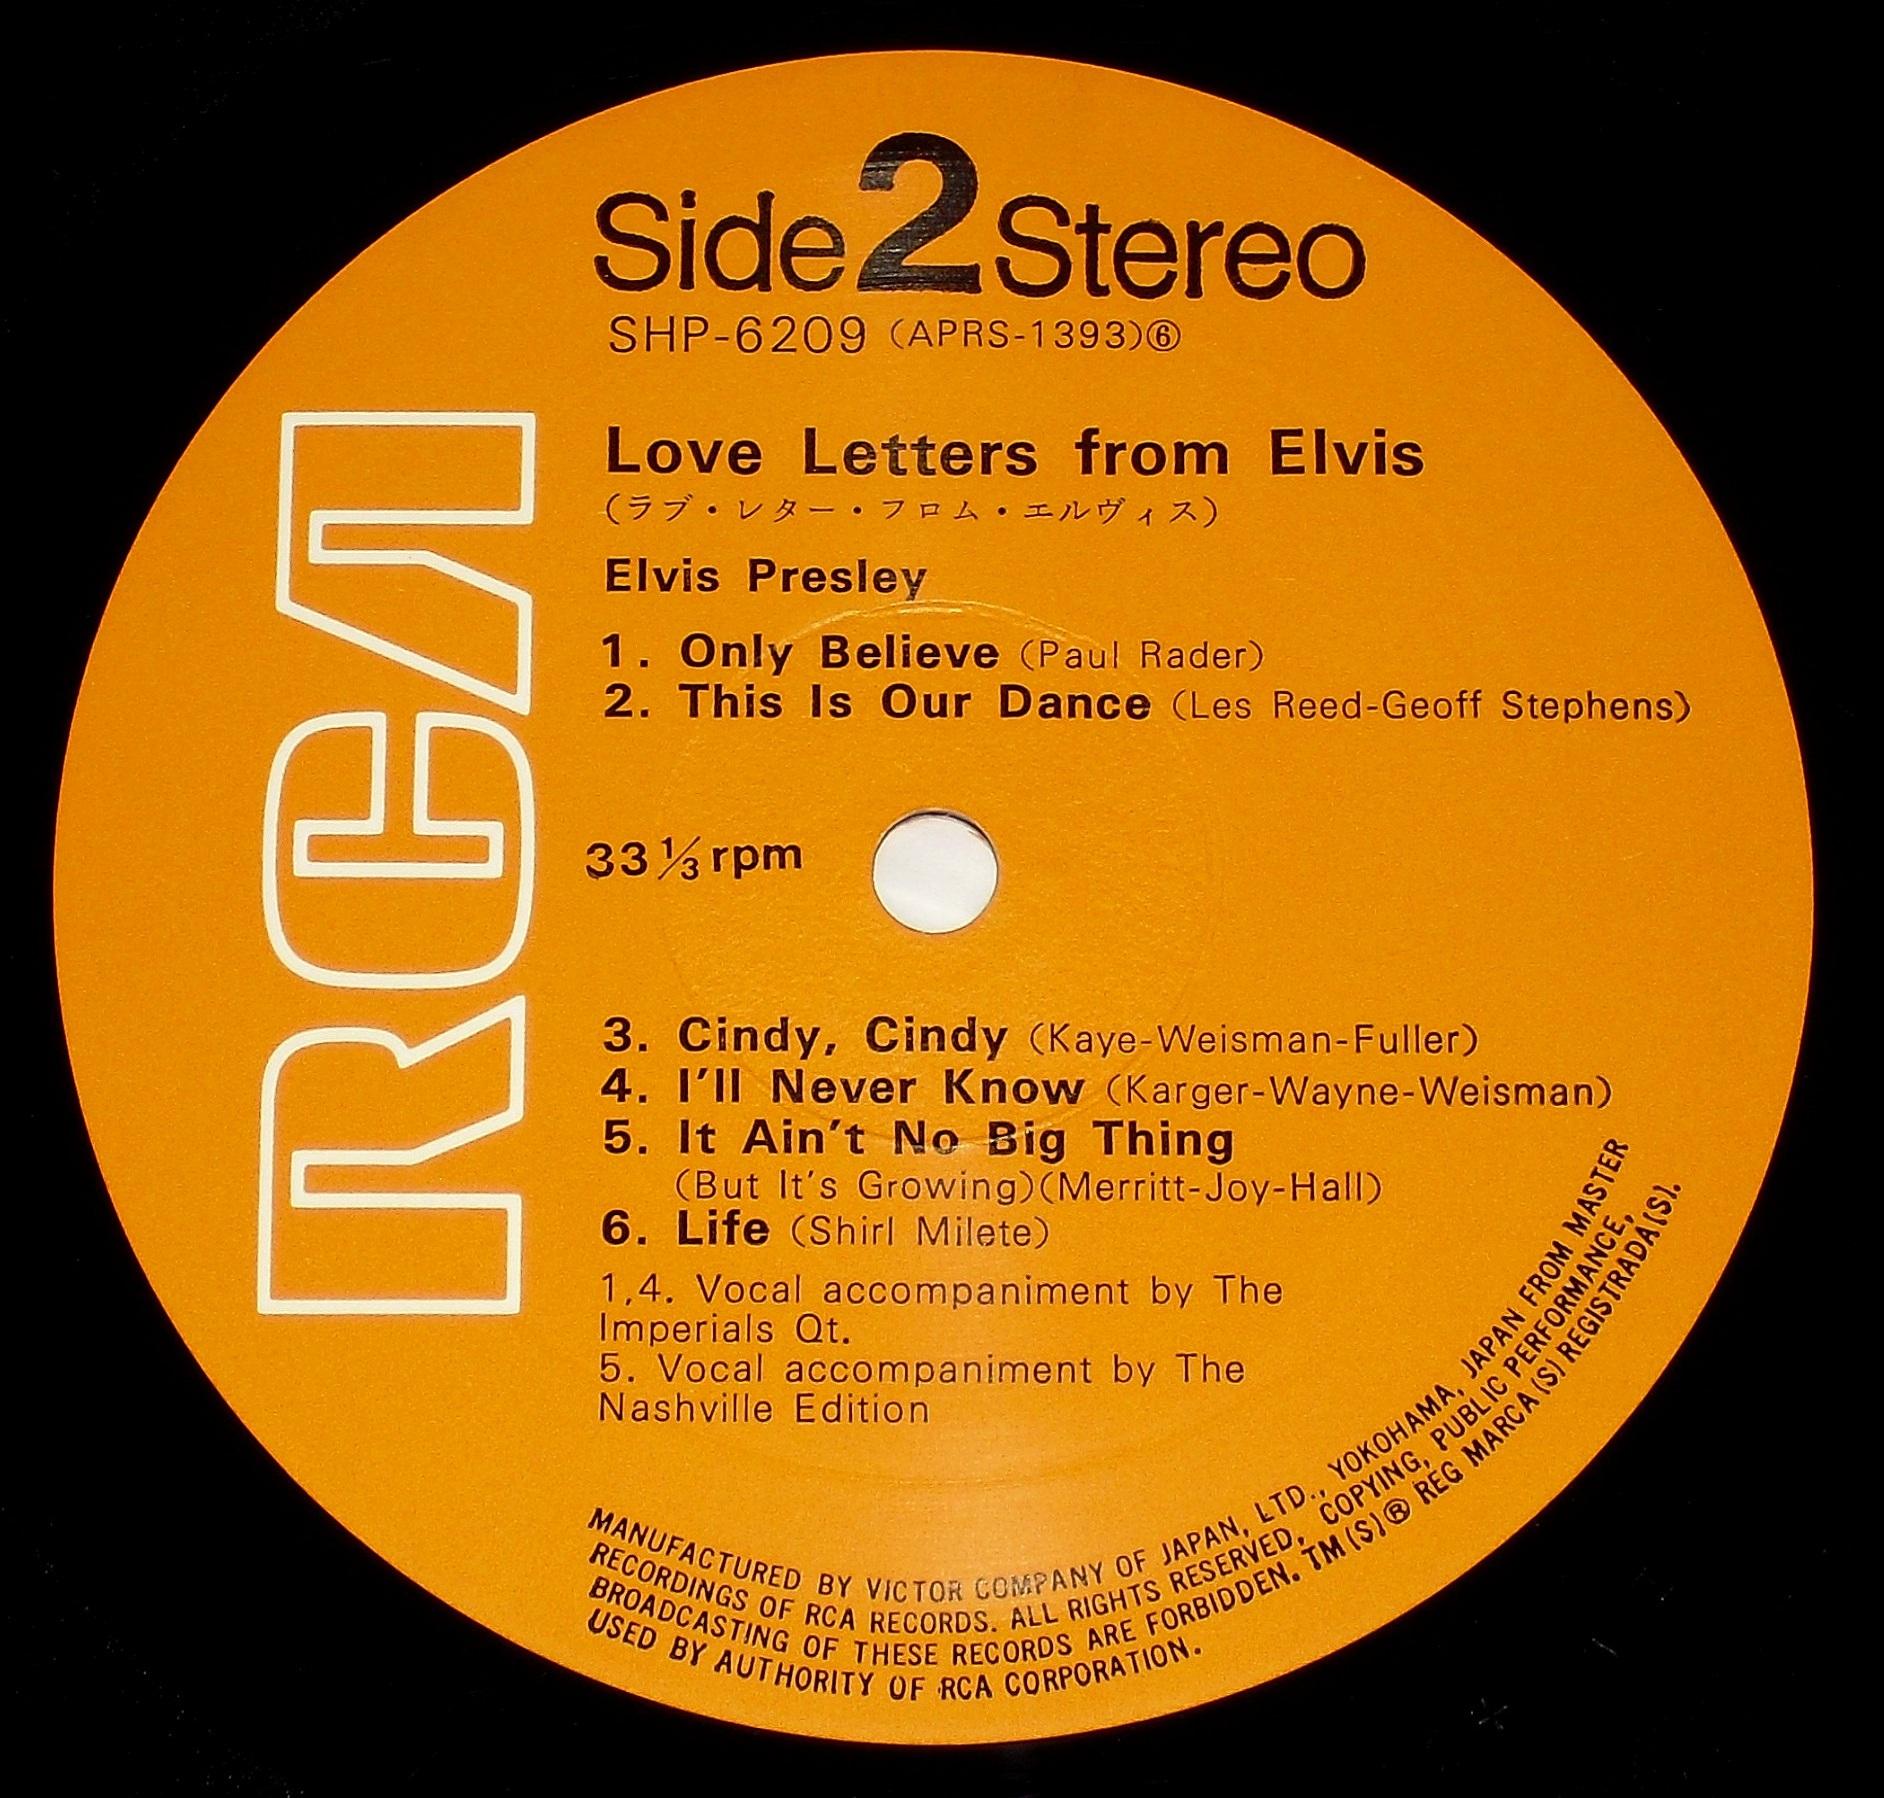 LOVE LETTERS FROM ELVIS 05s2xiorh